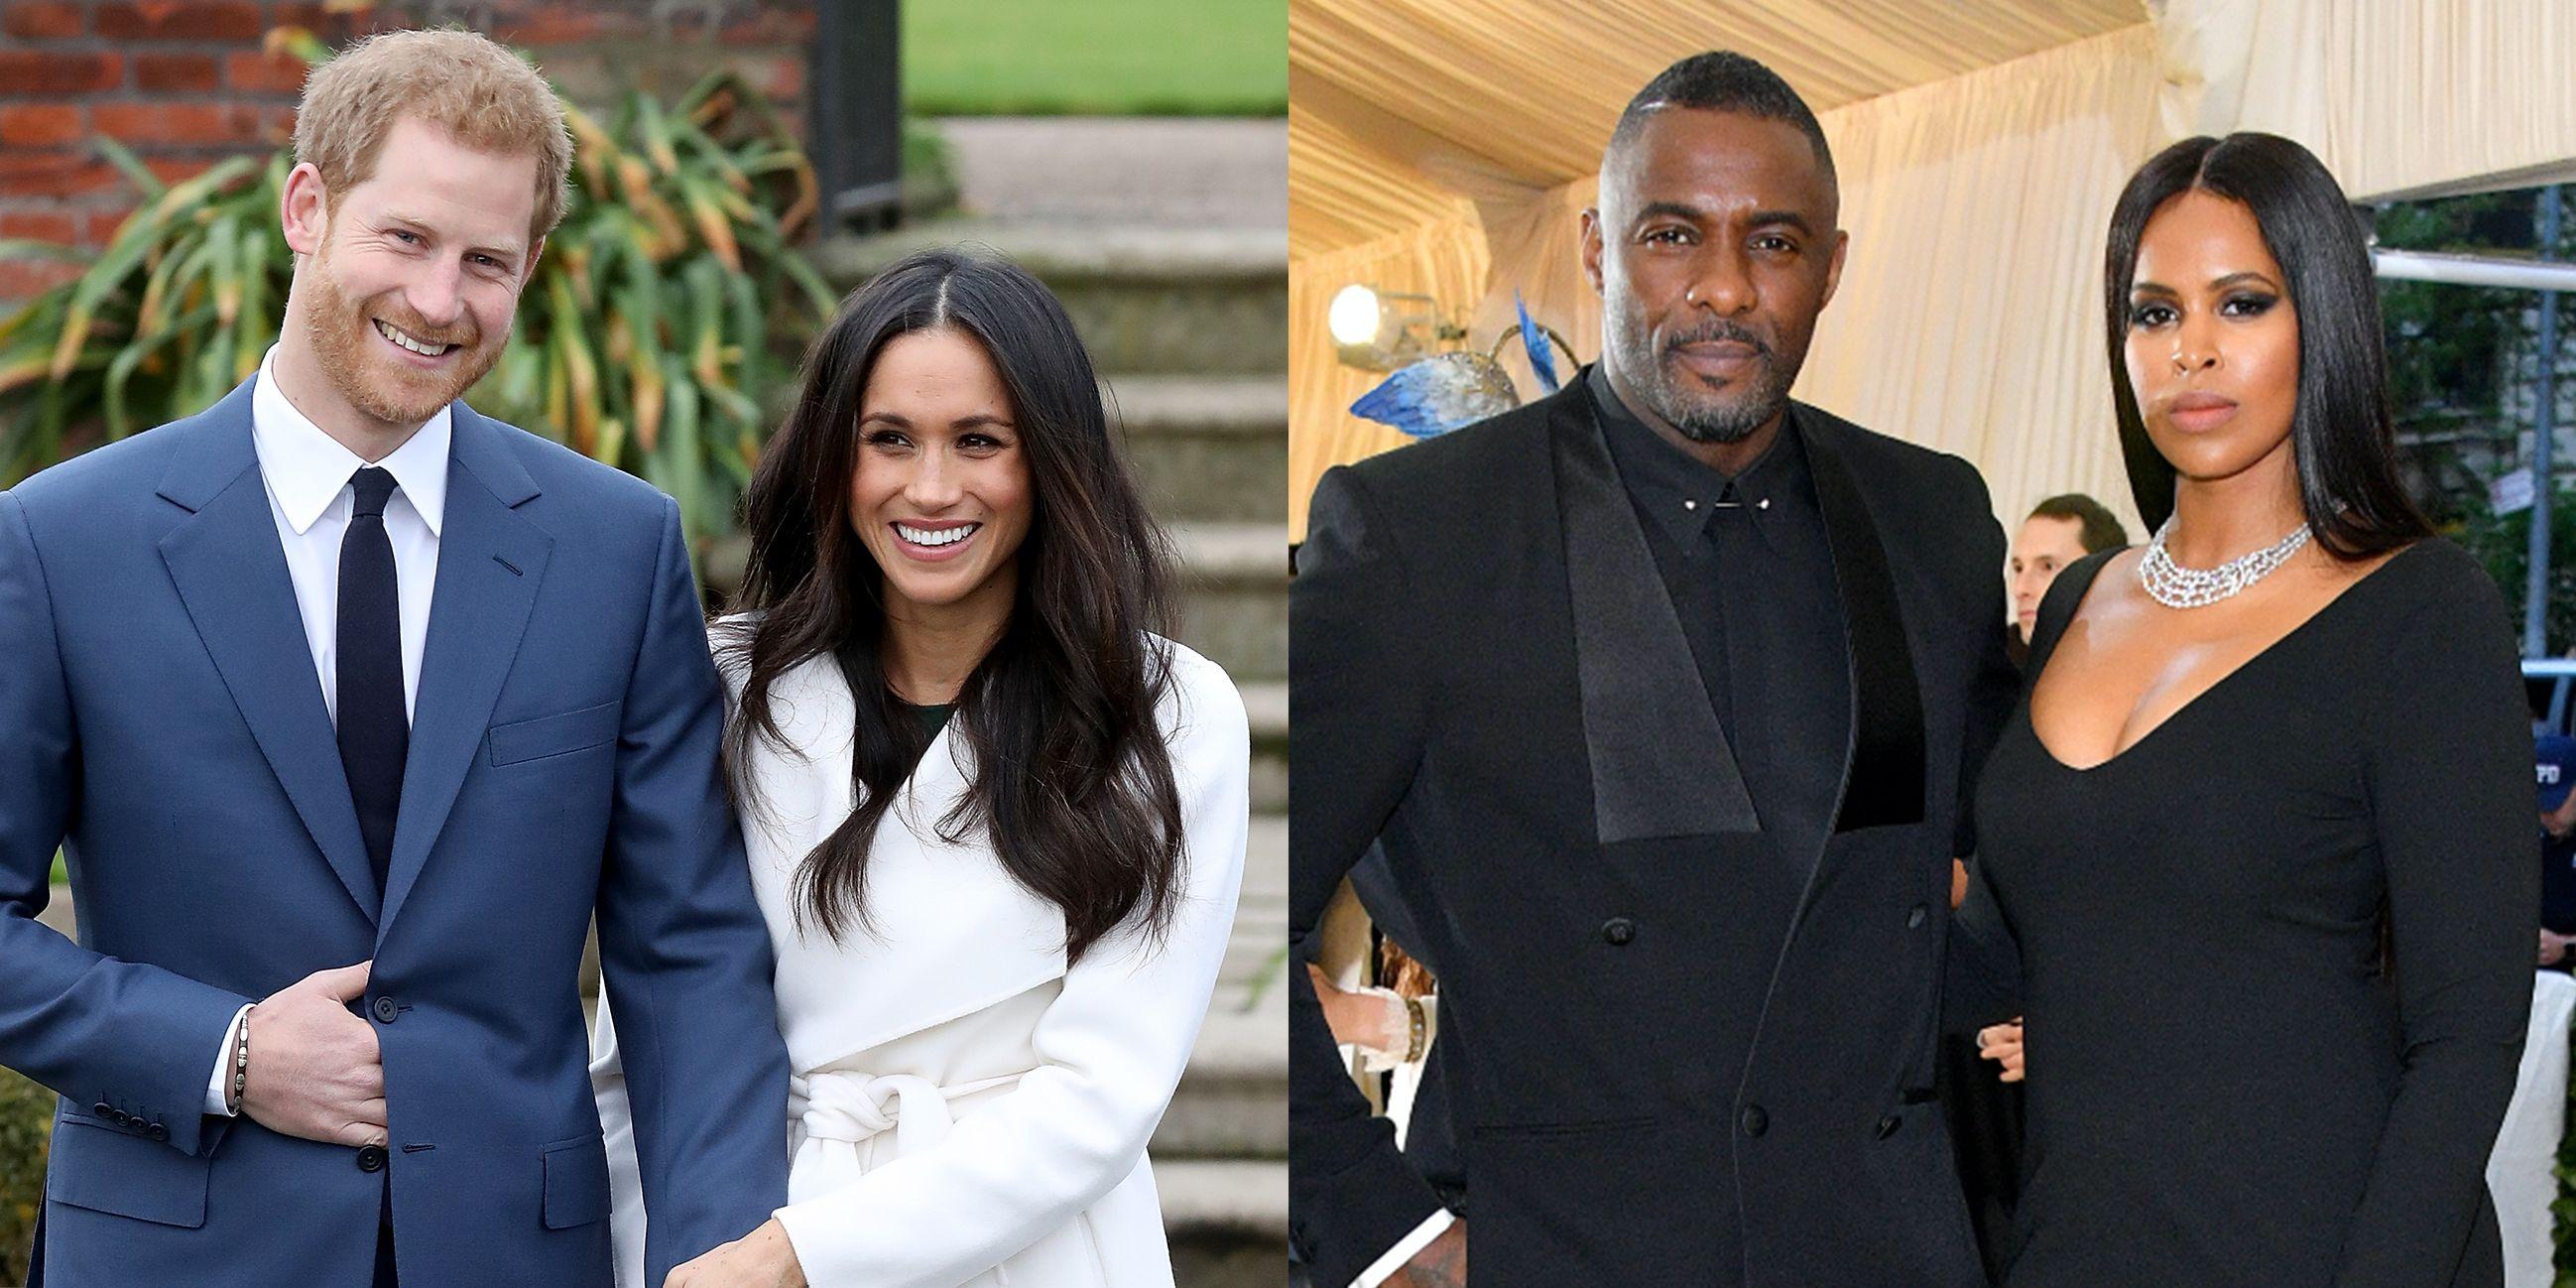 92f5bdb13 Meghan Markle and Prince Harry's Amazing Wedding Gift for Idris Elba ...